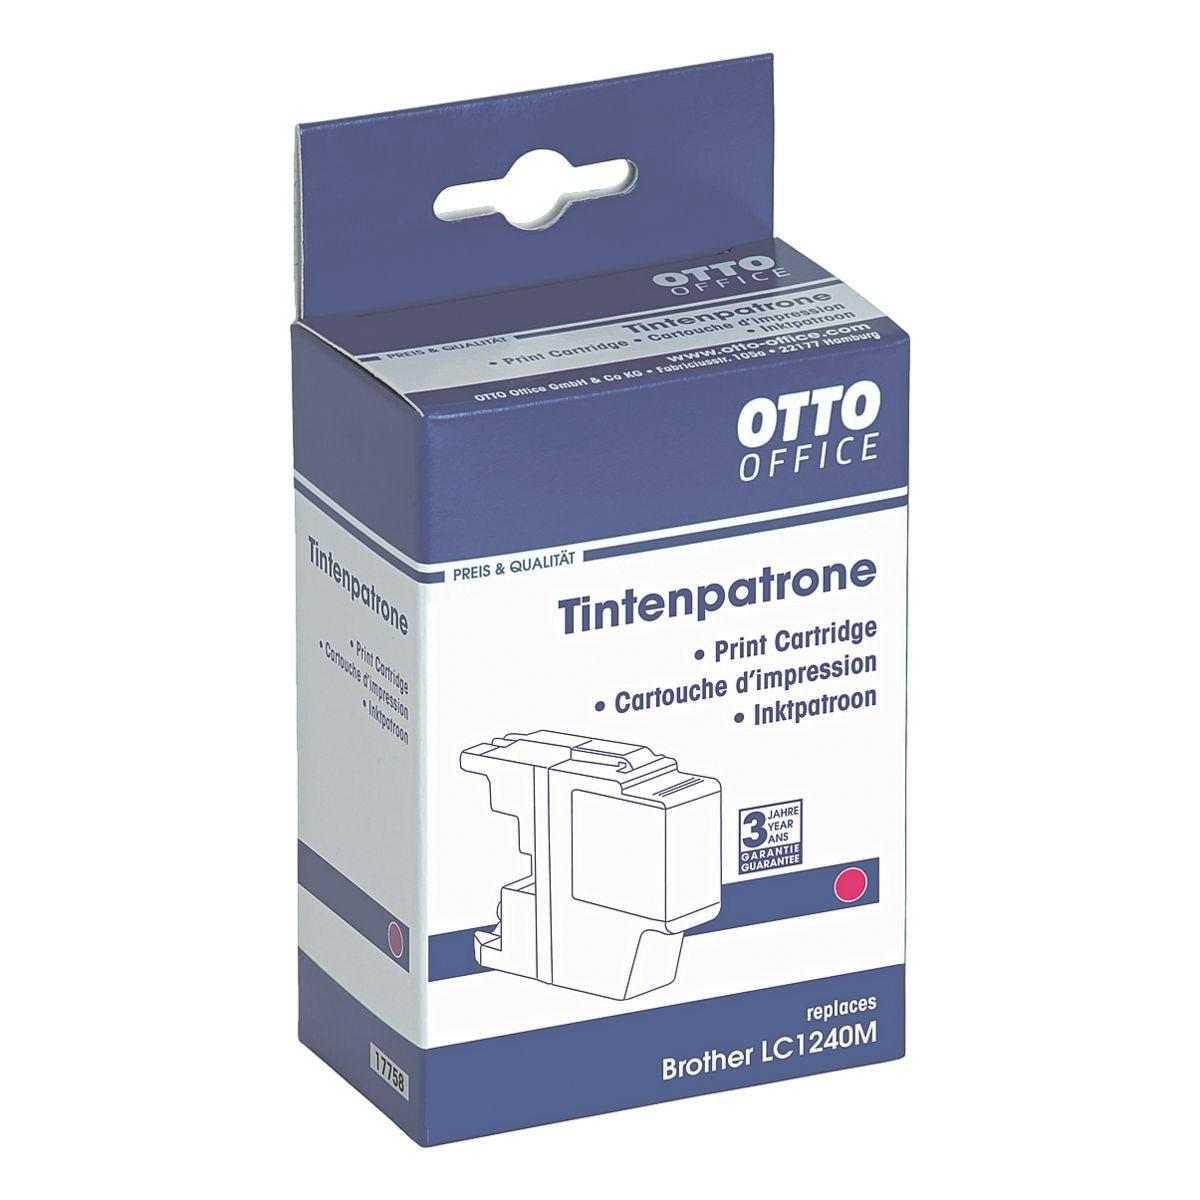 OTTO Office Tintenpatrone ersetzt Brother »LC1240M«